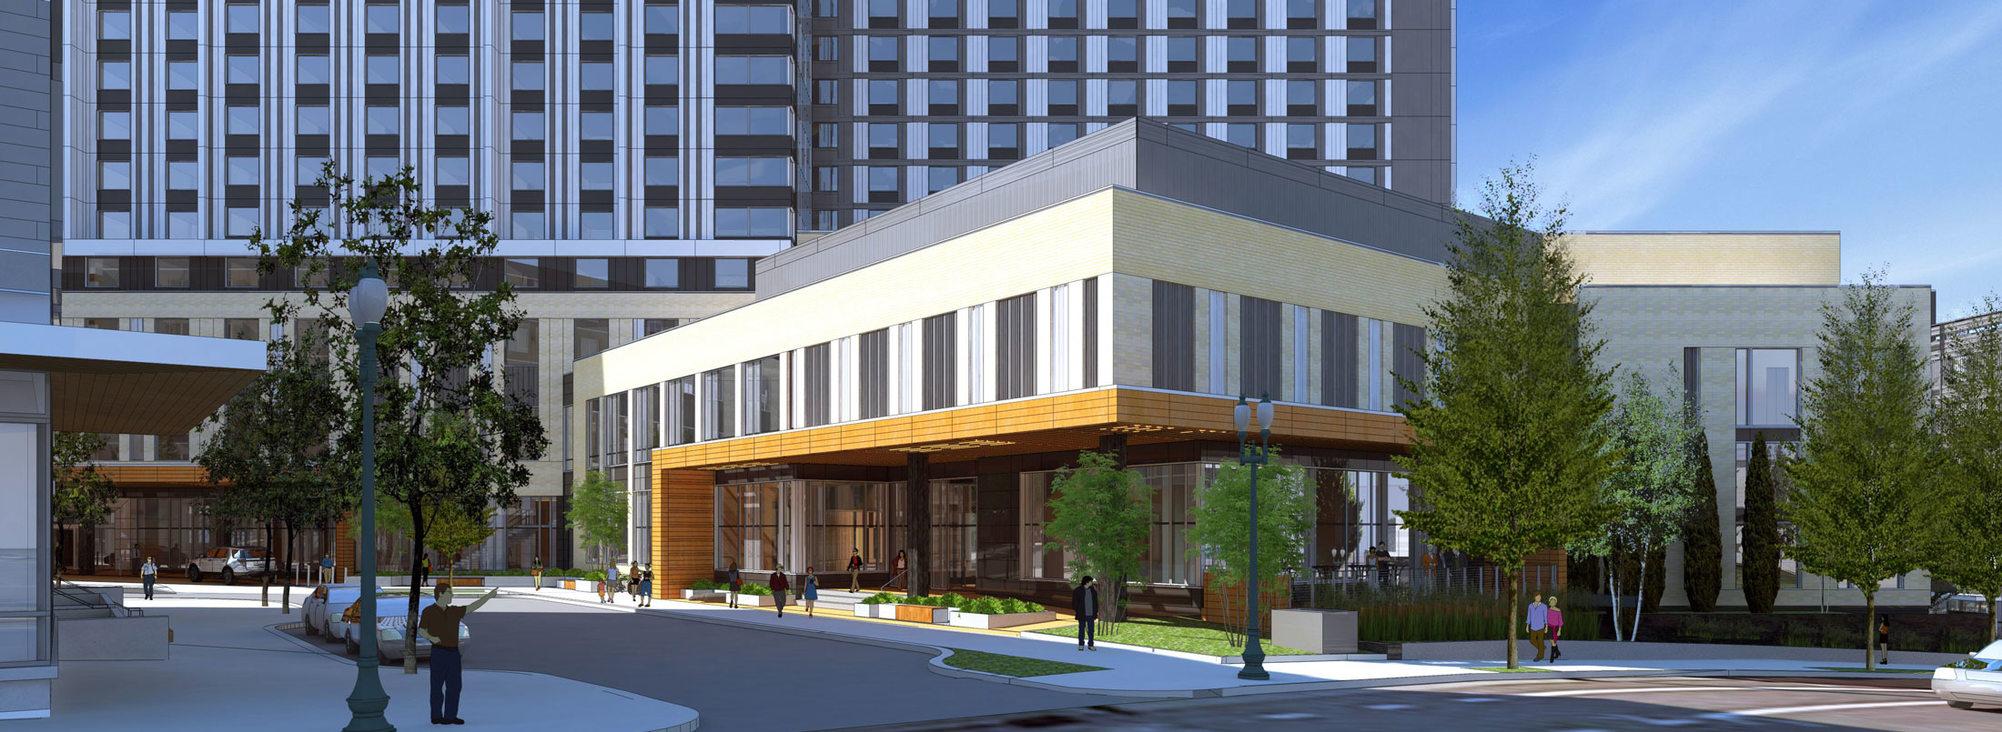 rendering of convention center hotel Multnomah entrance